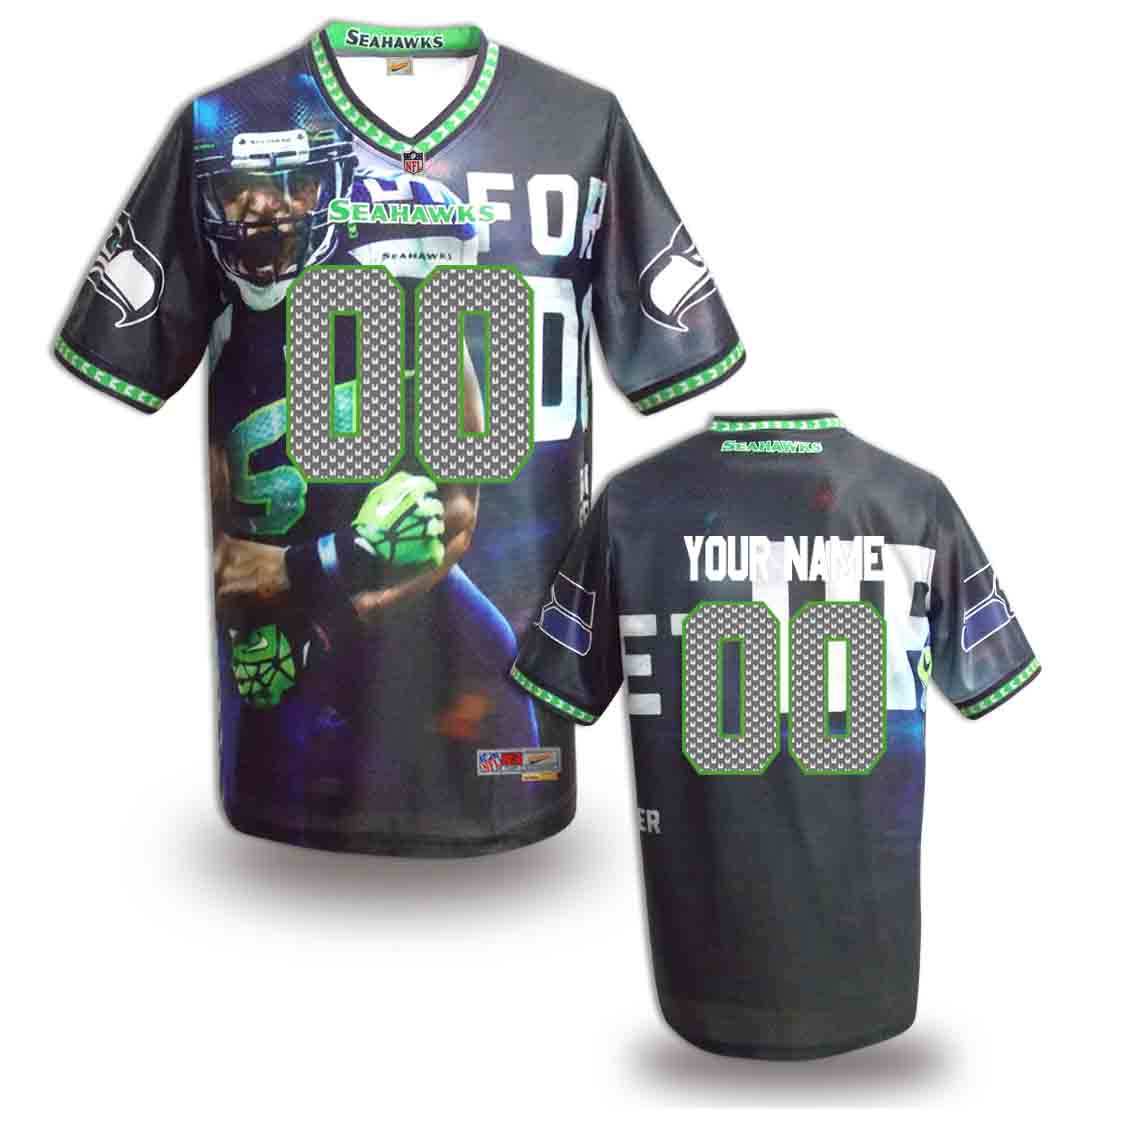 Nike Seahawks Customized Fashion Stitched Jerseys05